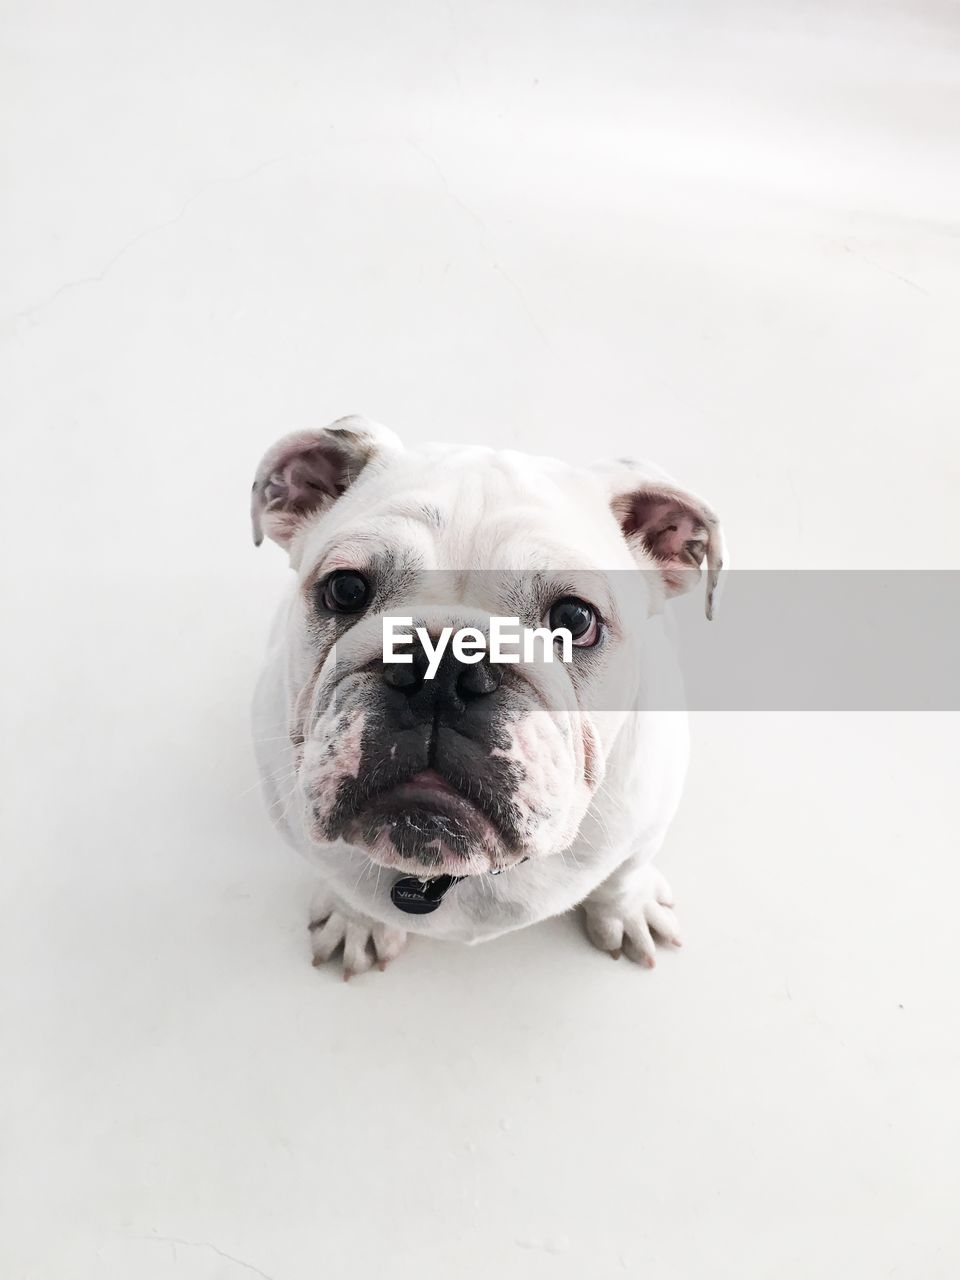 HIGH ANGLE VIEW OF WHITE DOG